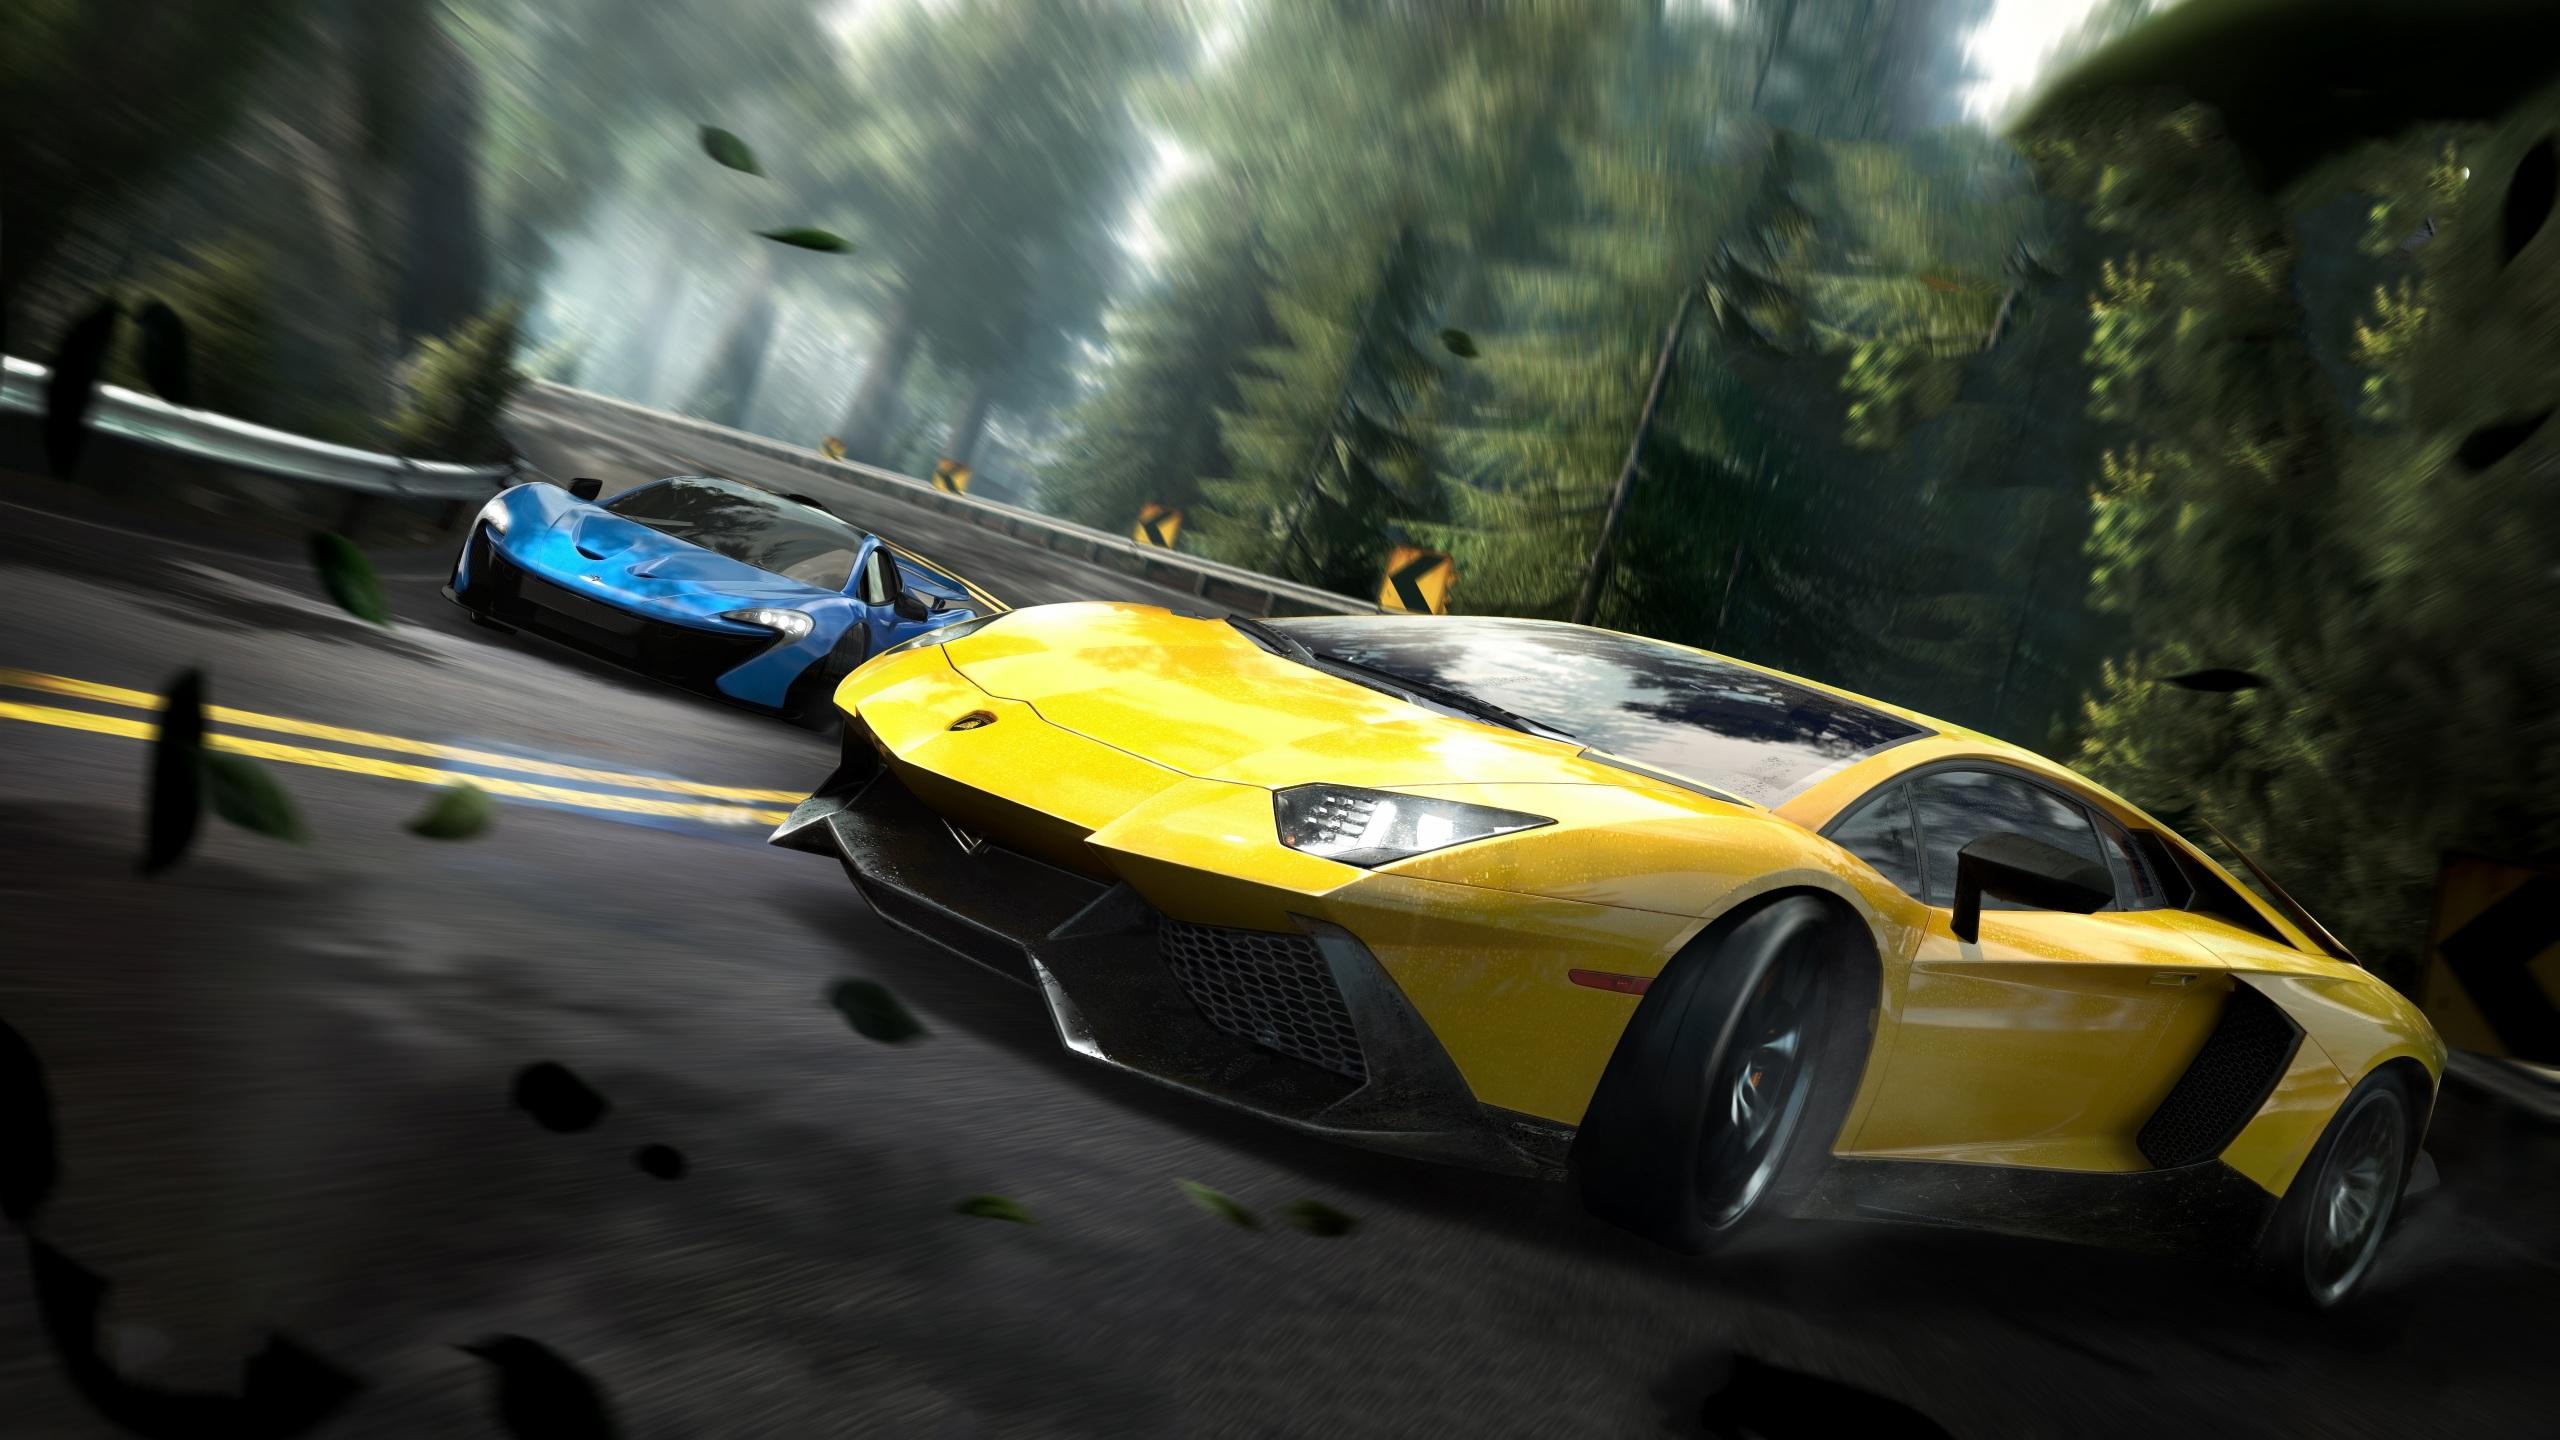 Картинка Need for Speed Lamborghini Edge Aventador 3д Желтый Игры Автомобили 2560x1440 Ламборгини желтых желтые желтая 3D Графика компьютерная игра авто машина машины автомобиль